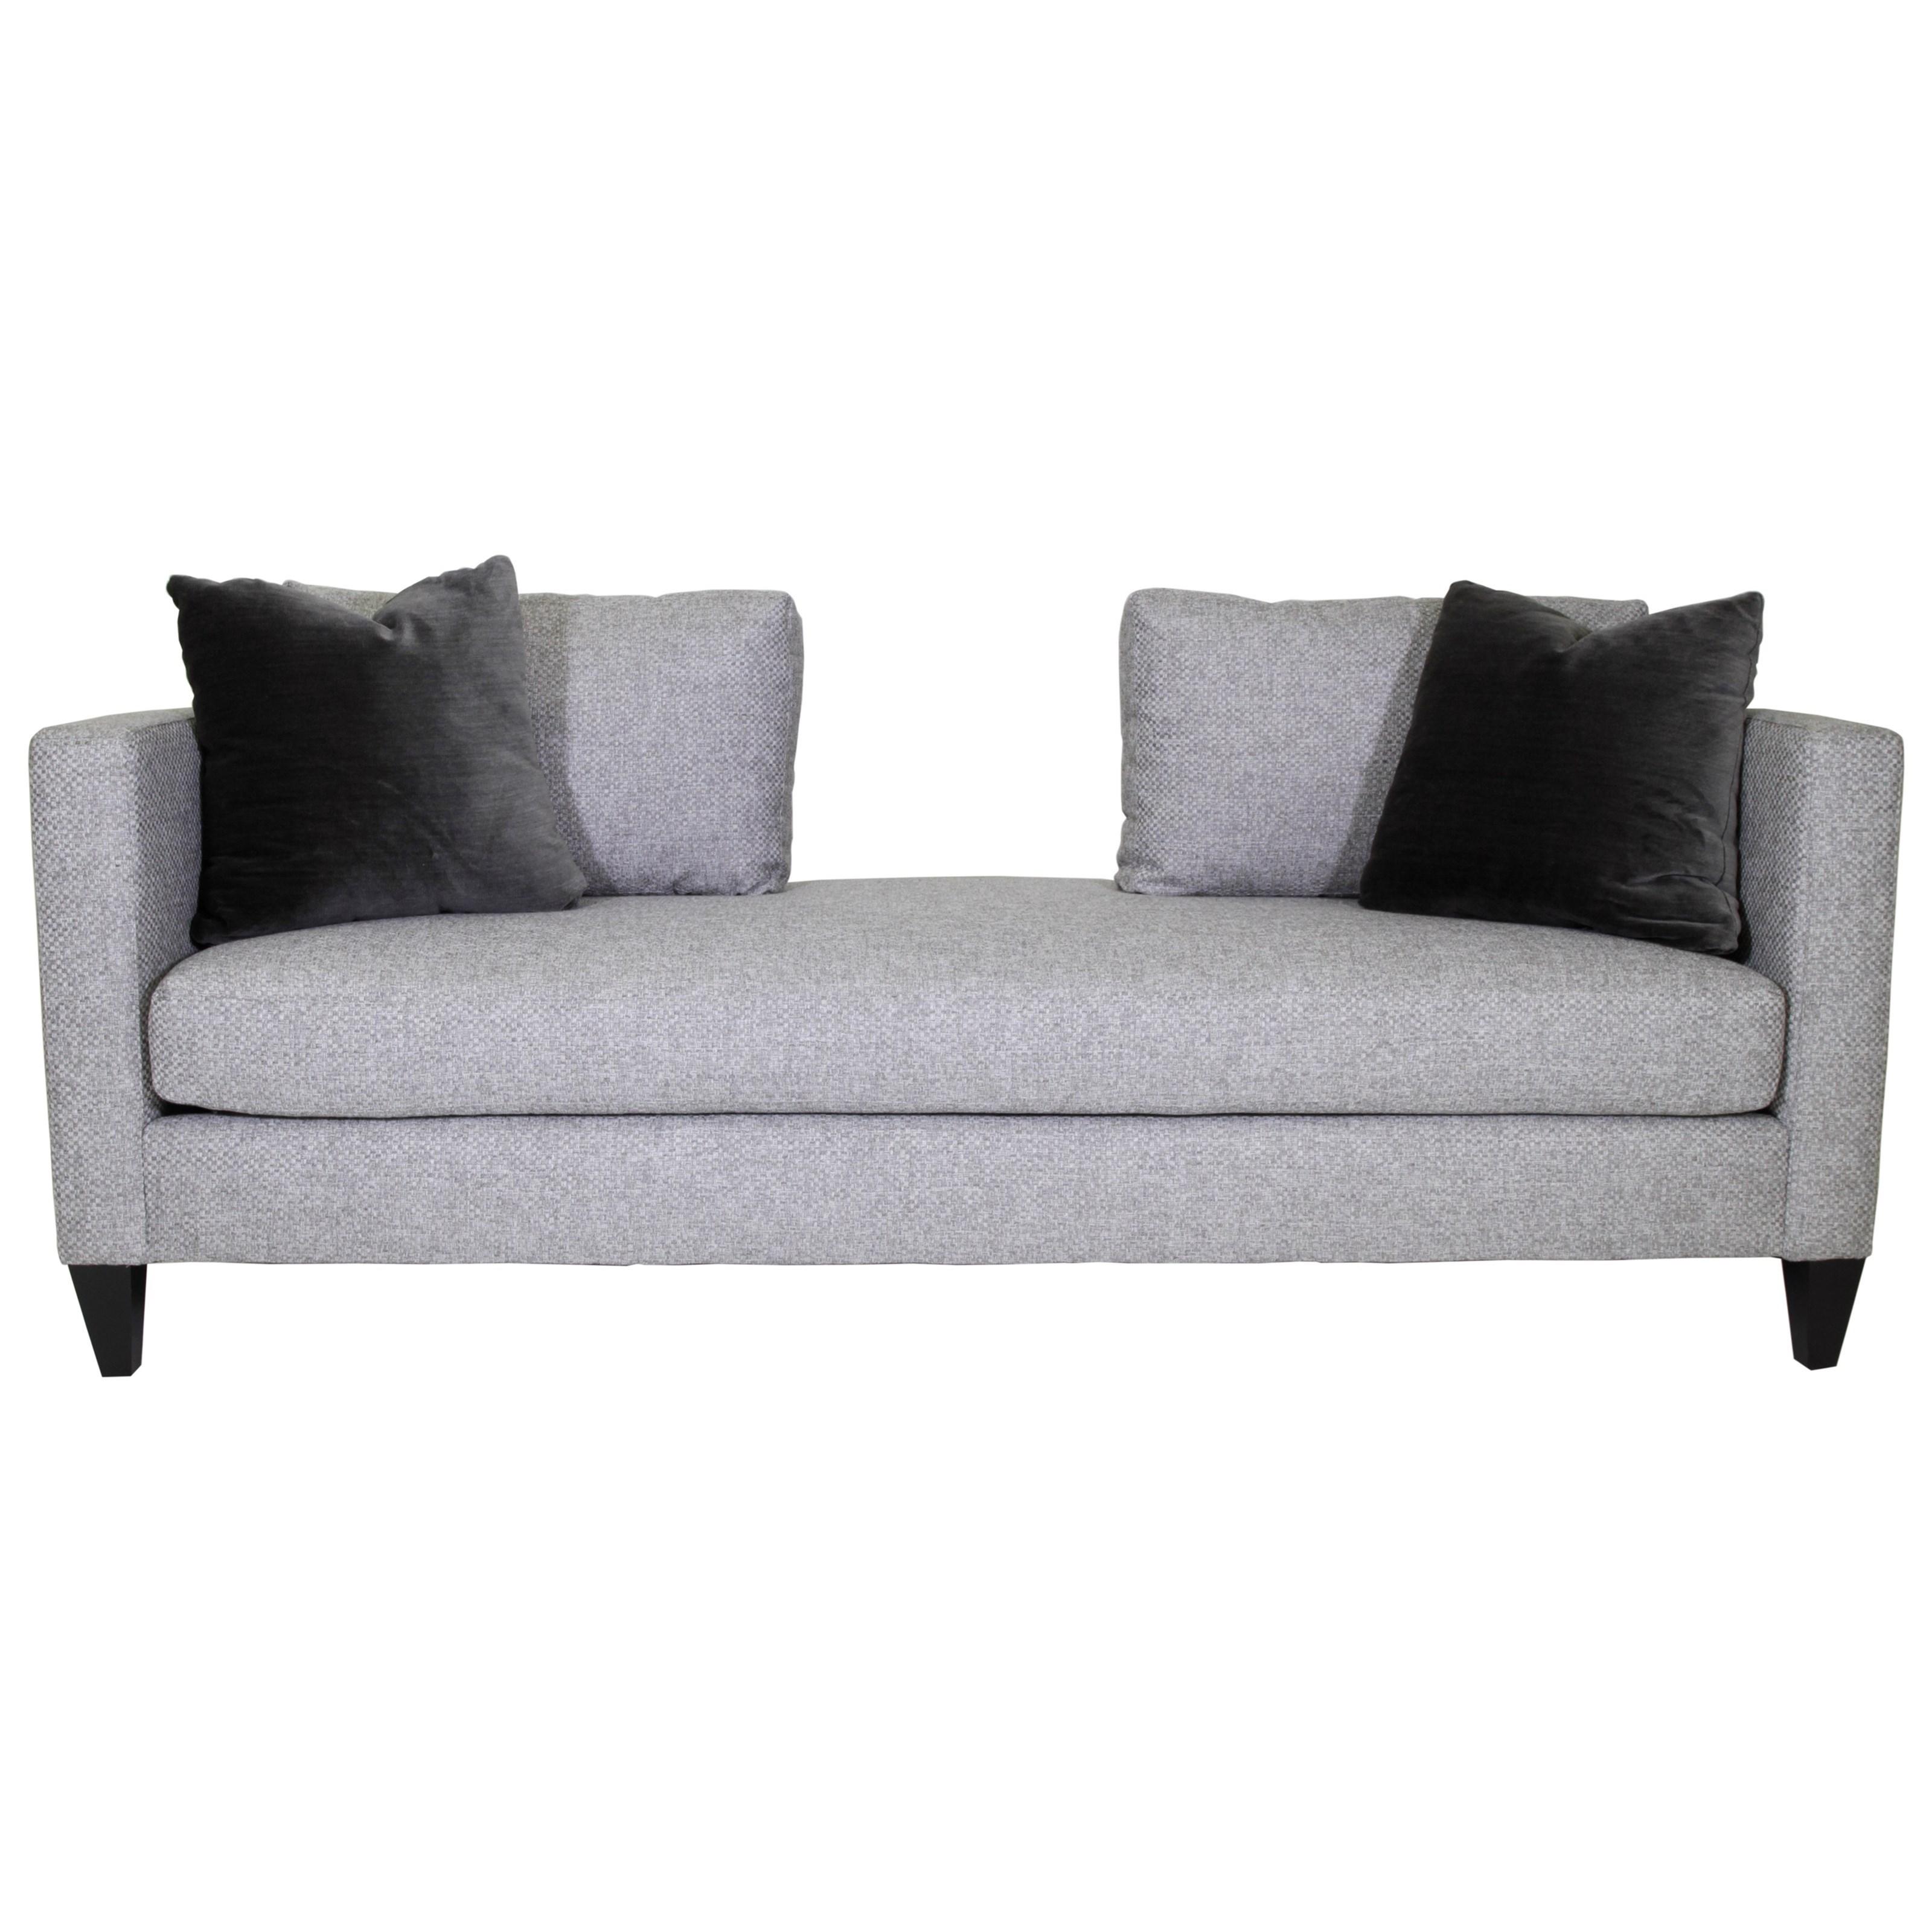 Bernhardt Saxon Chaise - Item Number: N1189-2794-010